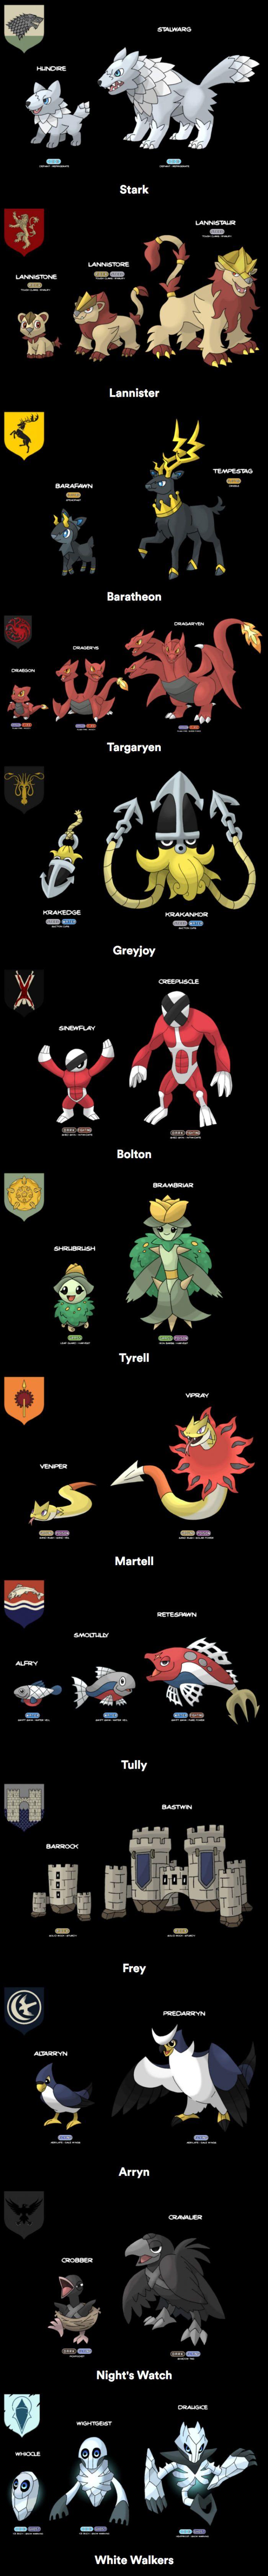 Game of thrones Pokémon crossover